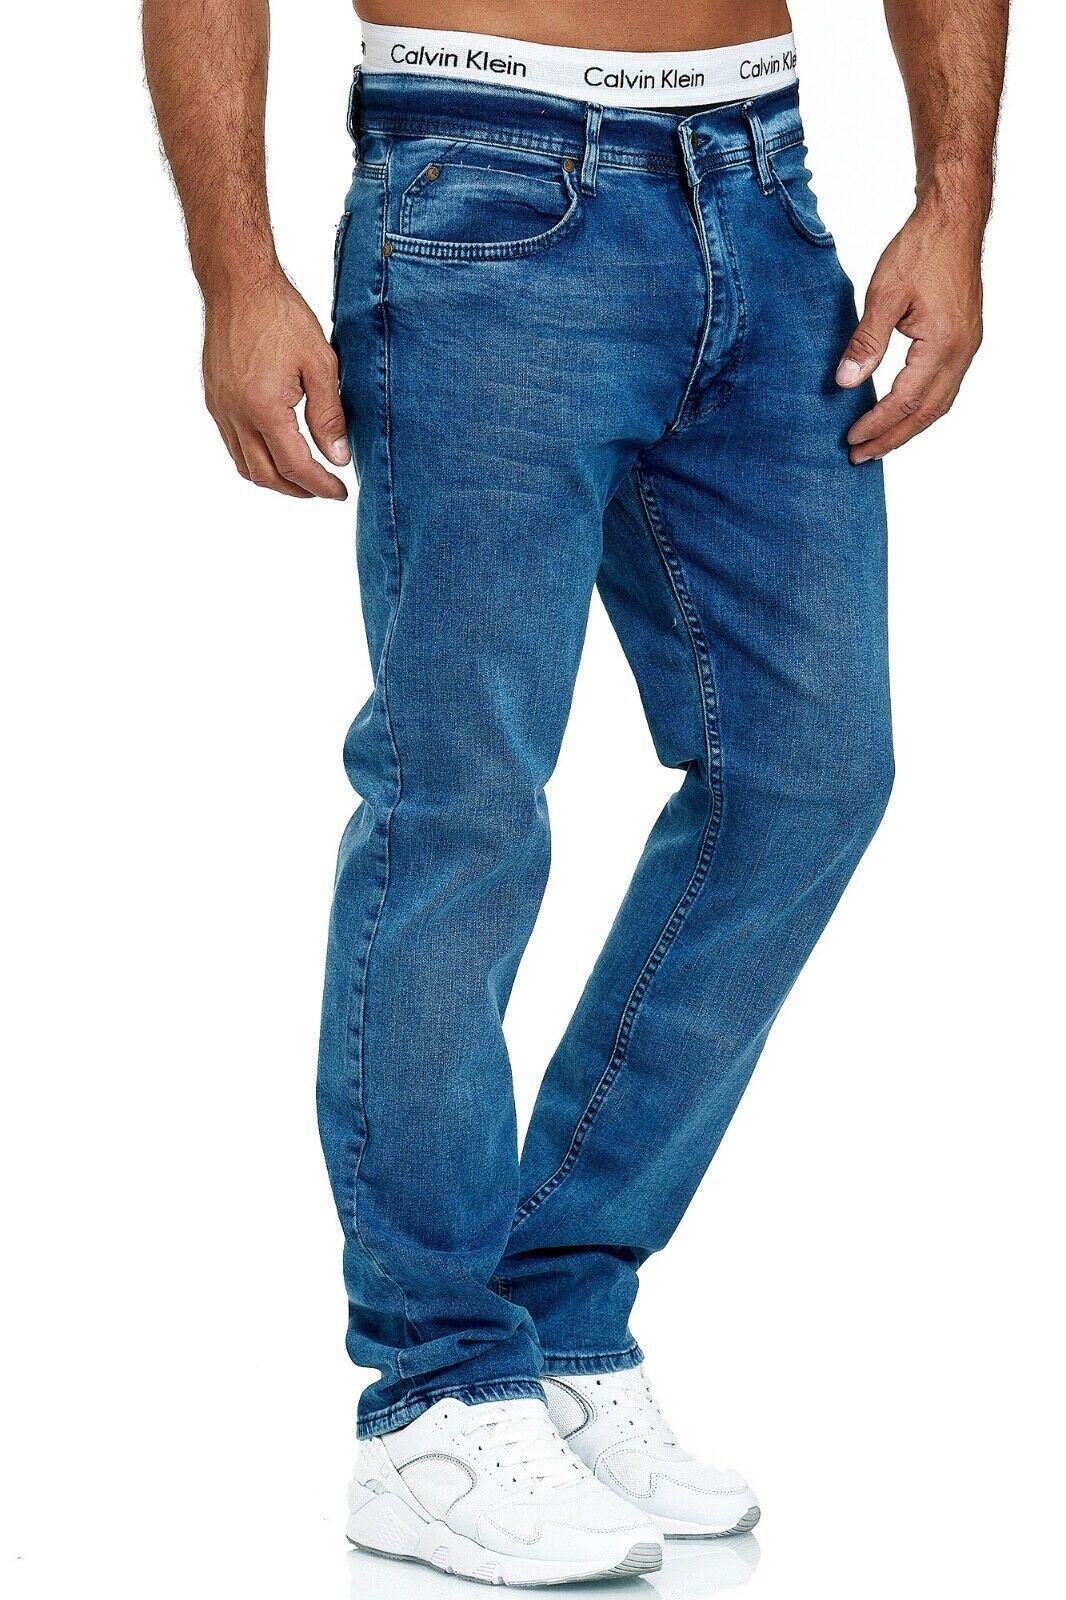 Herren-Jeans-Hose-Denim-KC-Black-Washed-Straight-Cut-Regular-Dicke-Naht-naehte Indexbild 63